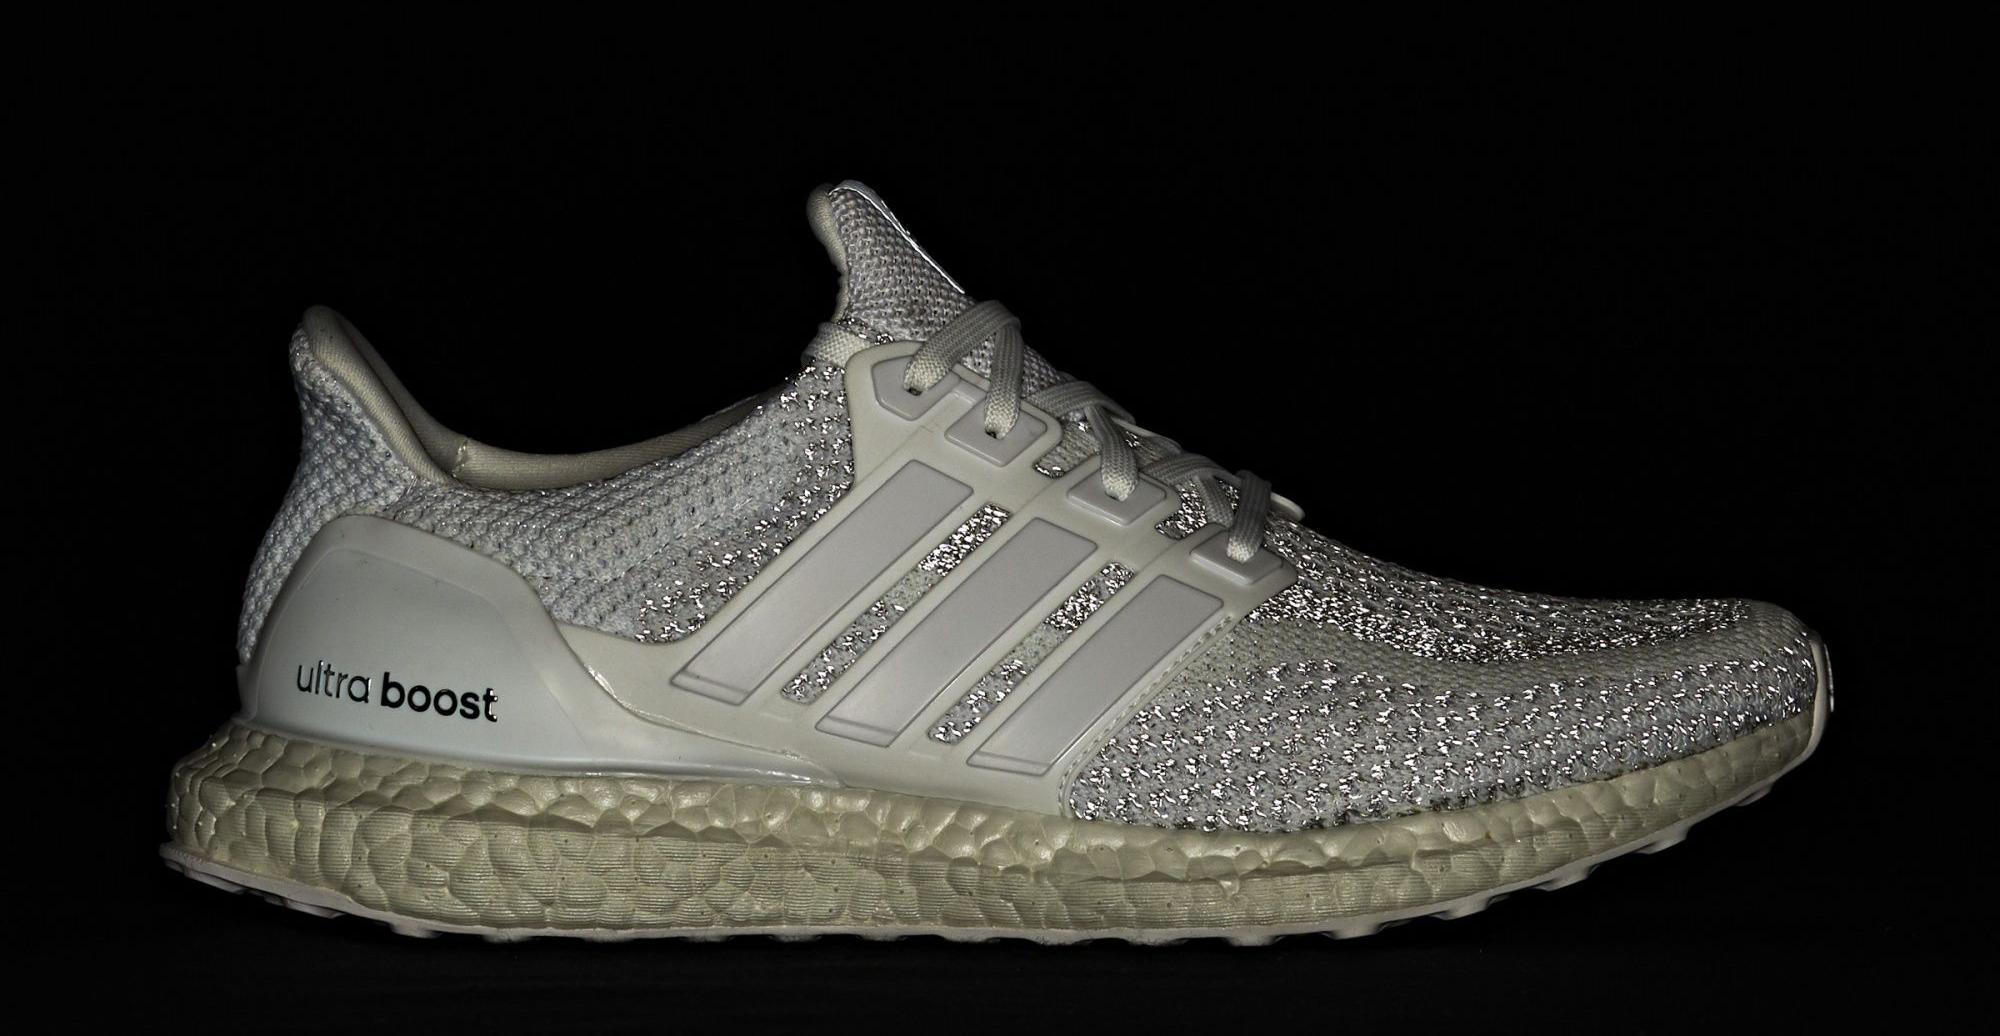 Adidas Ultra Boost White Reflective Flash